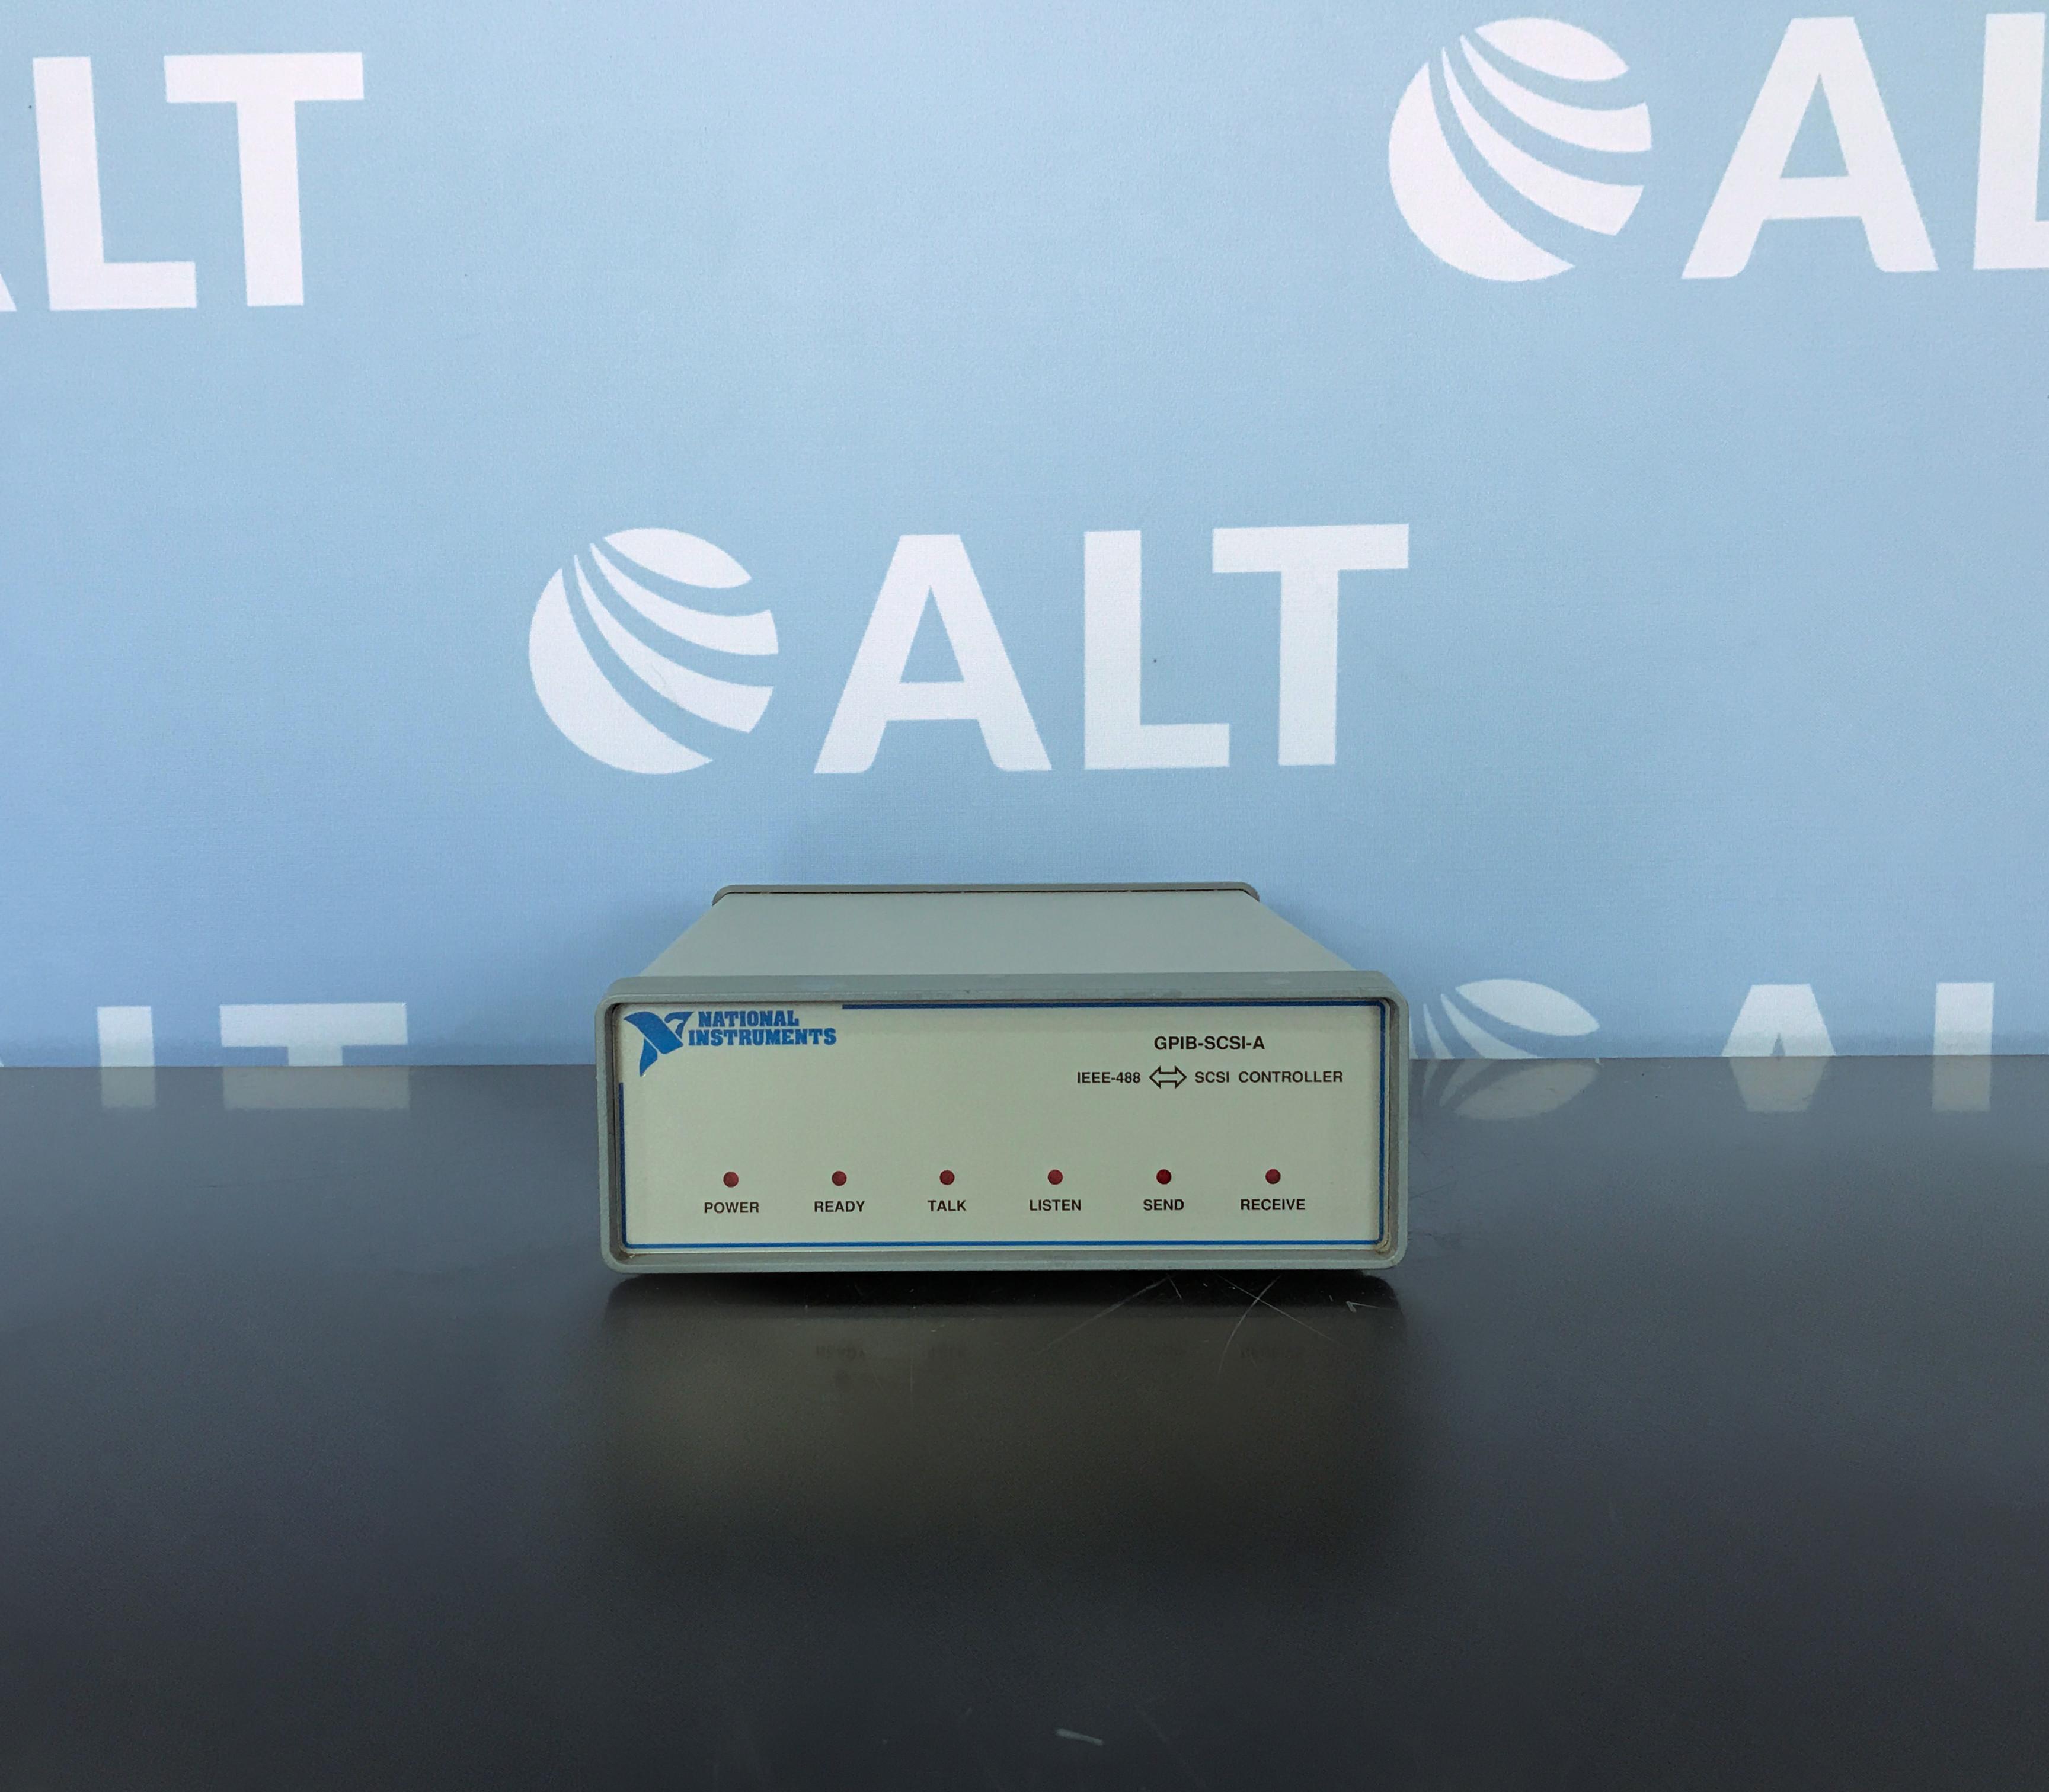 National Instruments GPIB SCSI-A Image